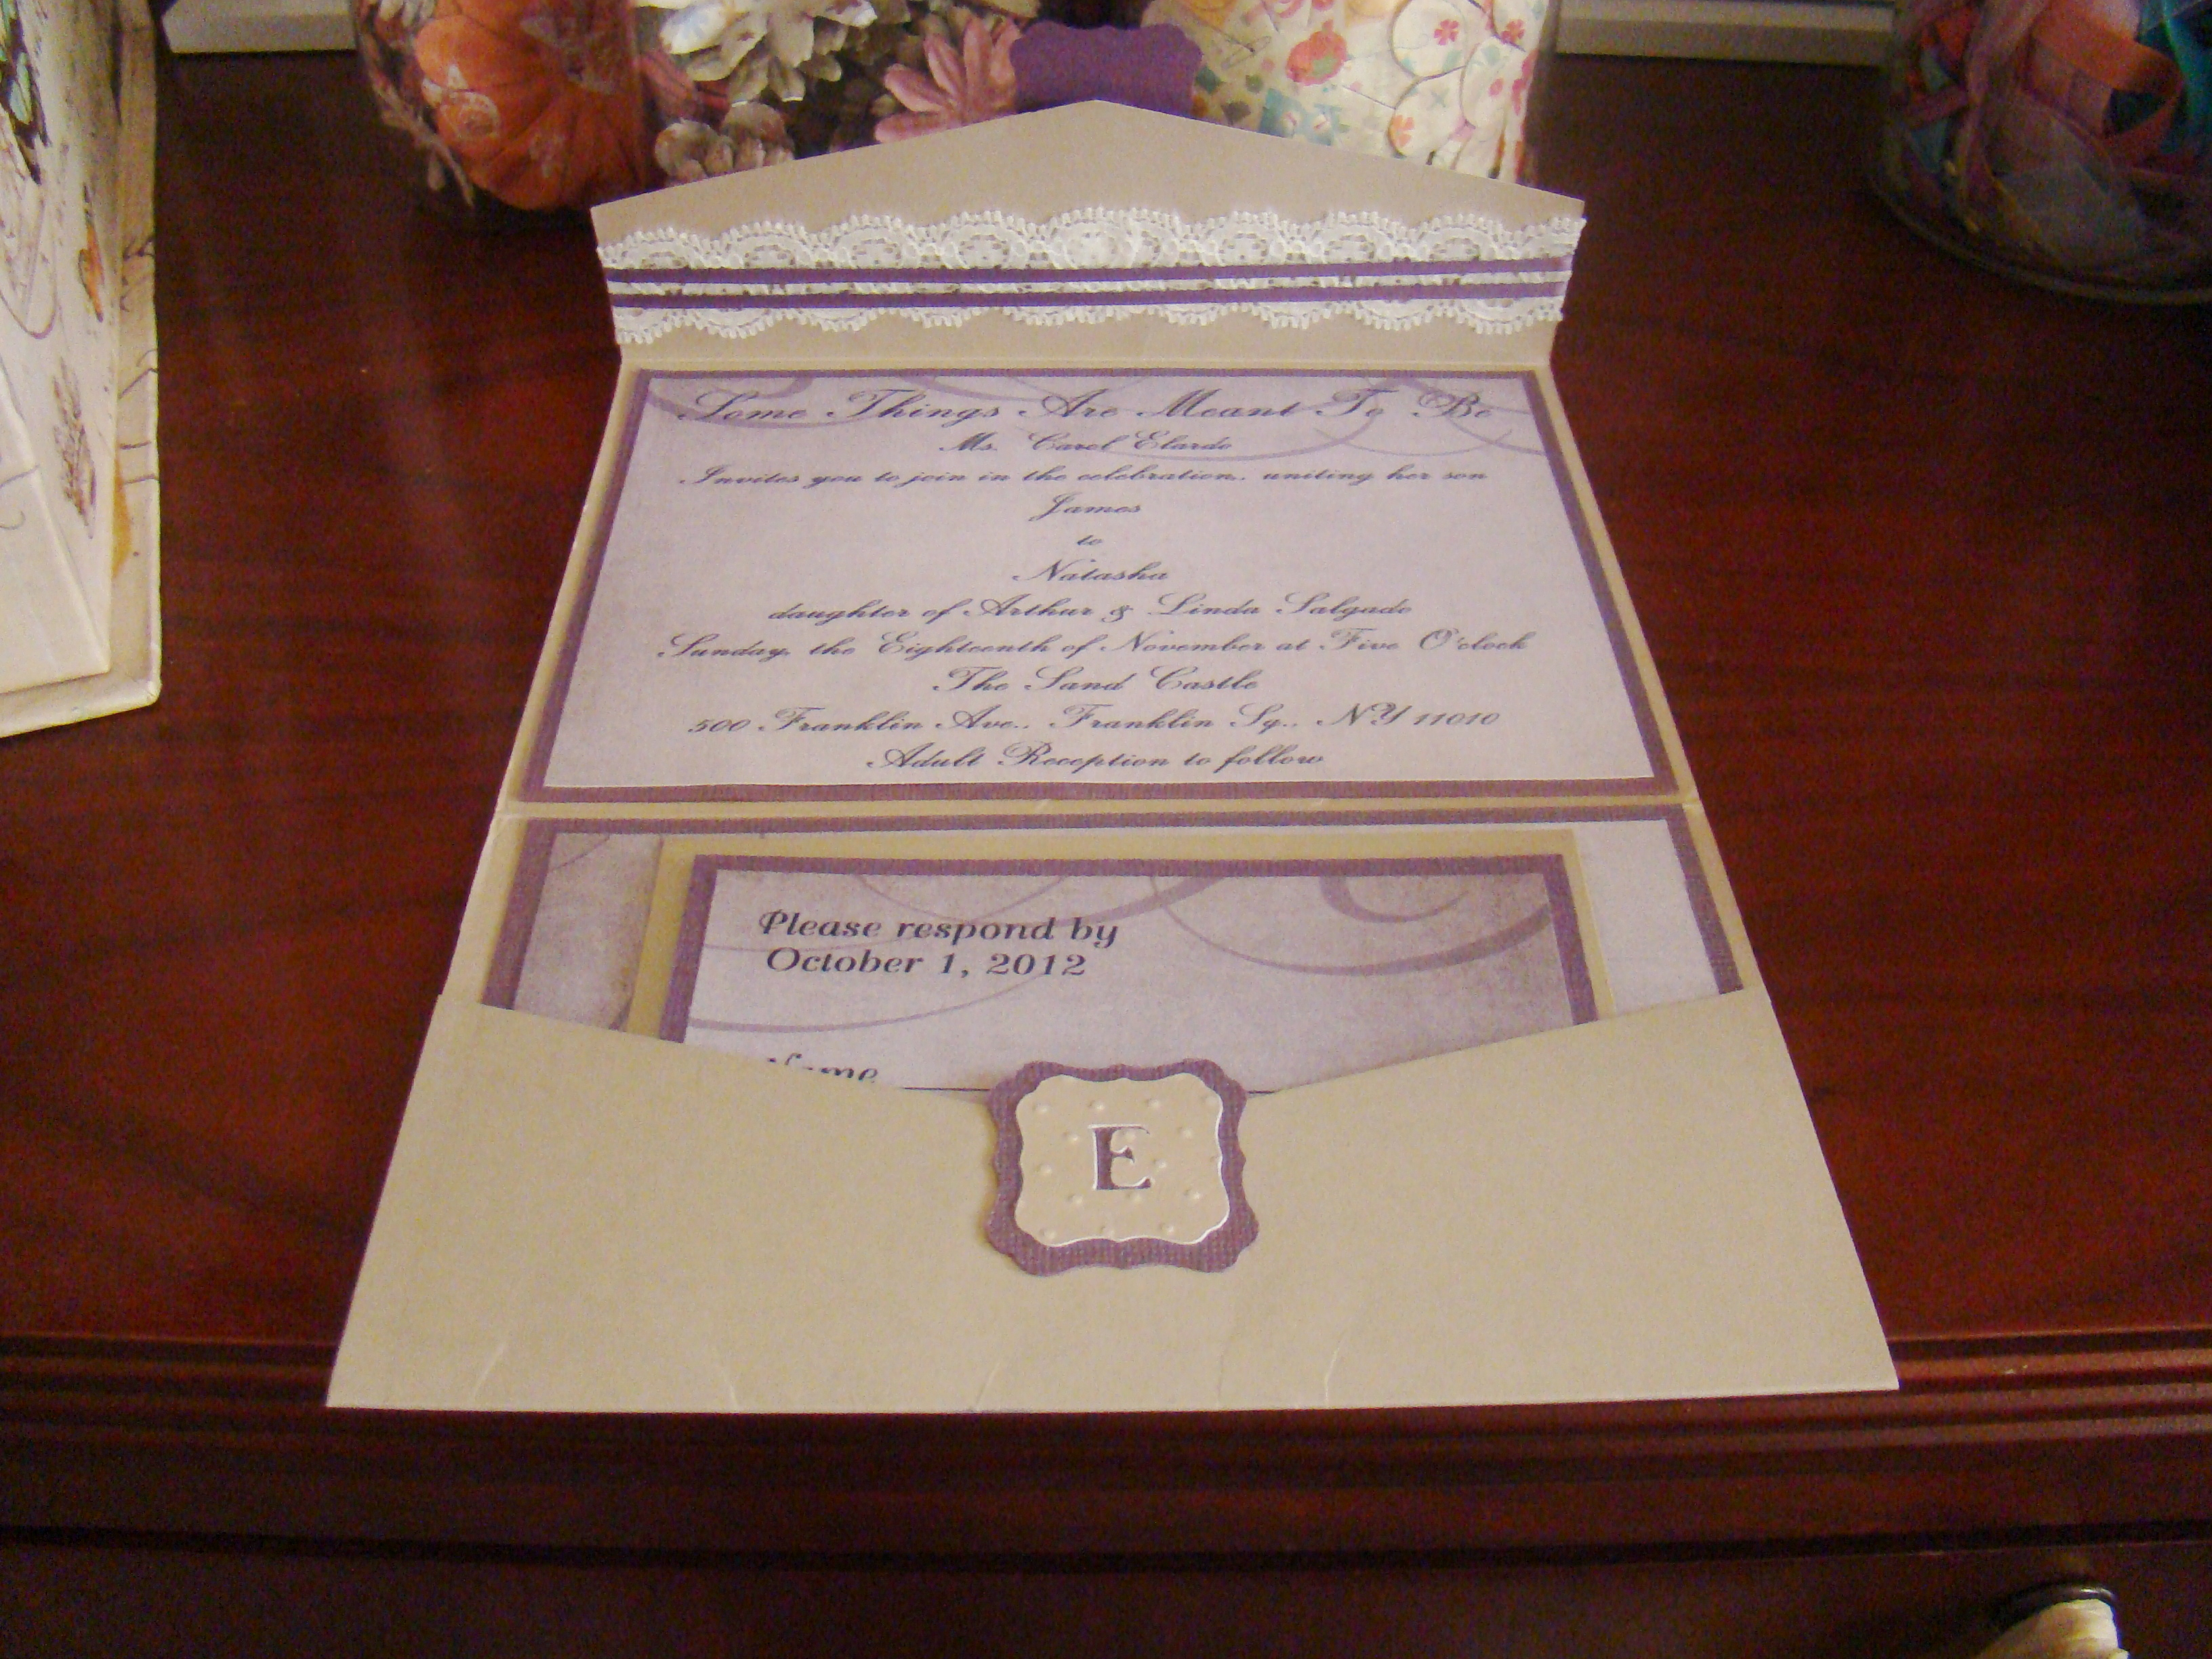 Project center wedding invitation graduation pinterest monicamarmolfo Gallery